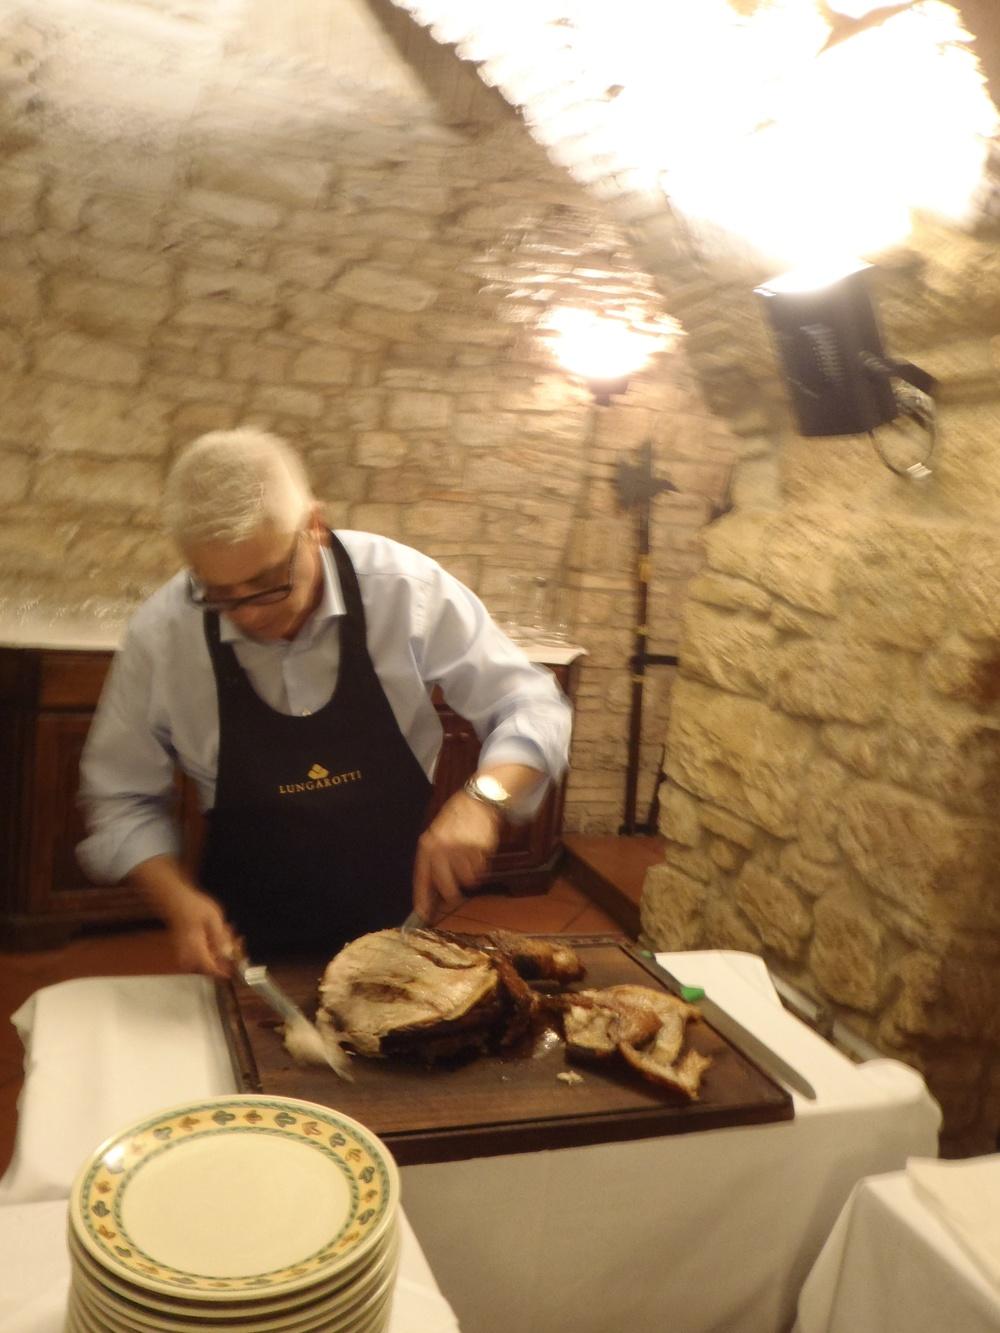 CRO Italy web 2013 - 028.jpg